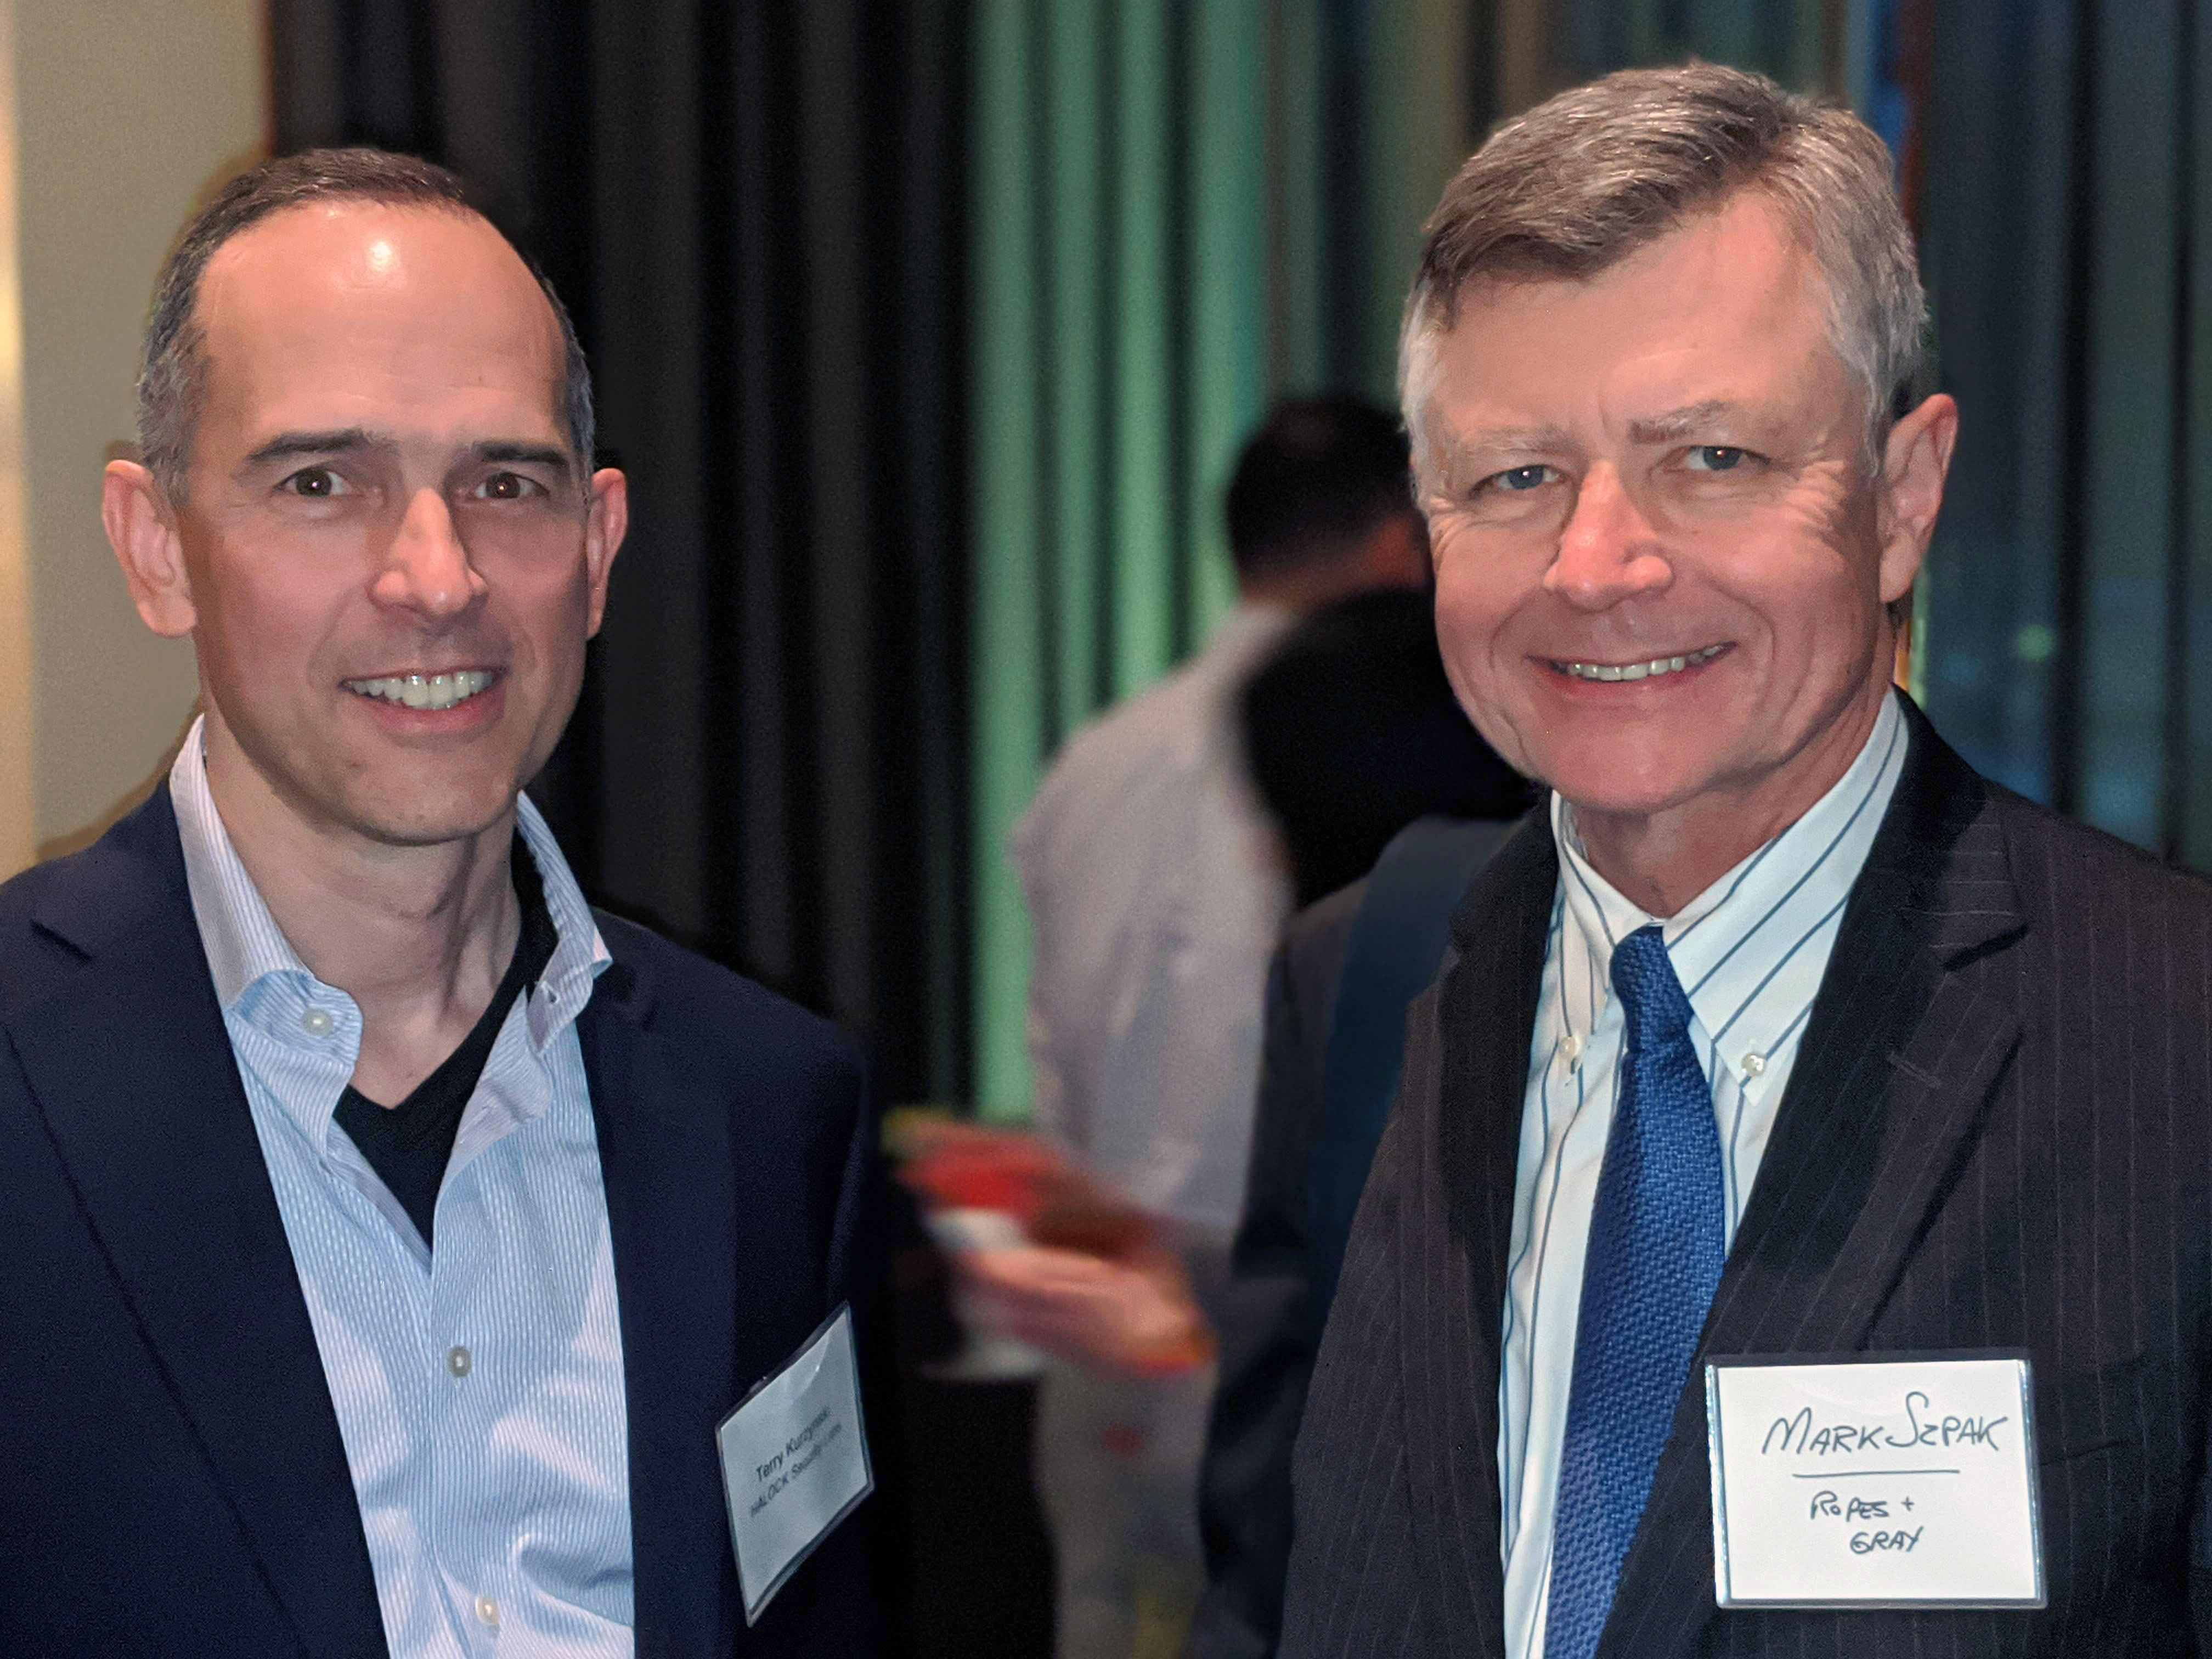 Terry Kurzynski HALOCK Whiskey Business at RSA